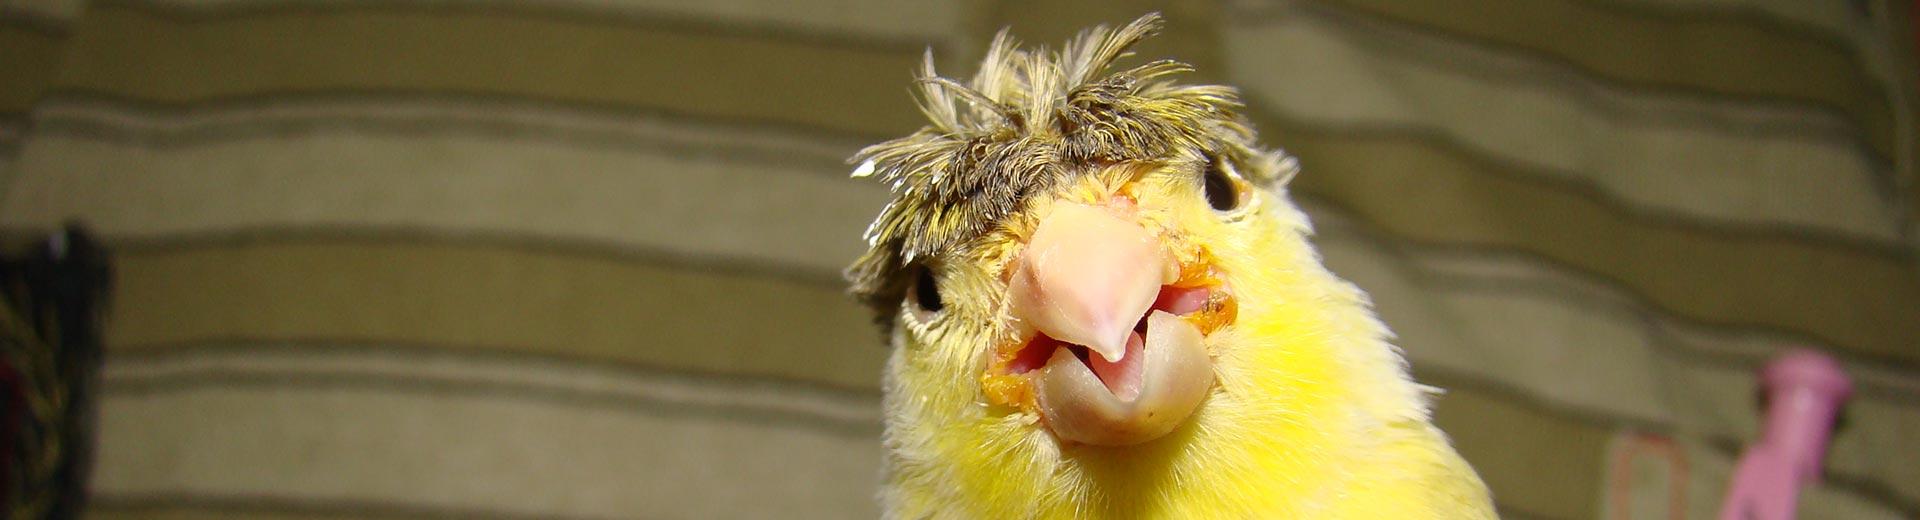 Vogels - kanarie